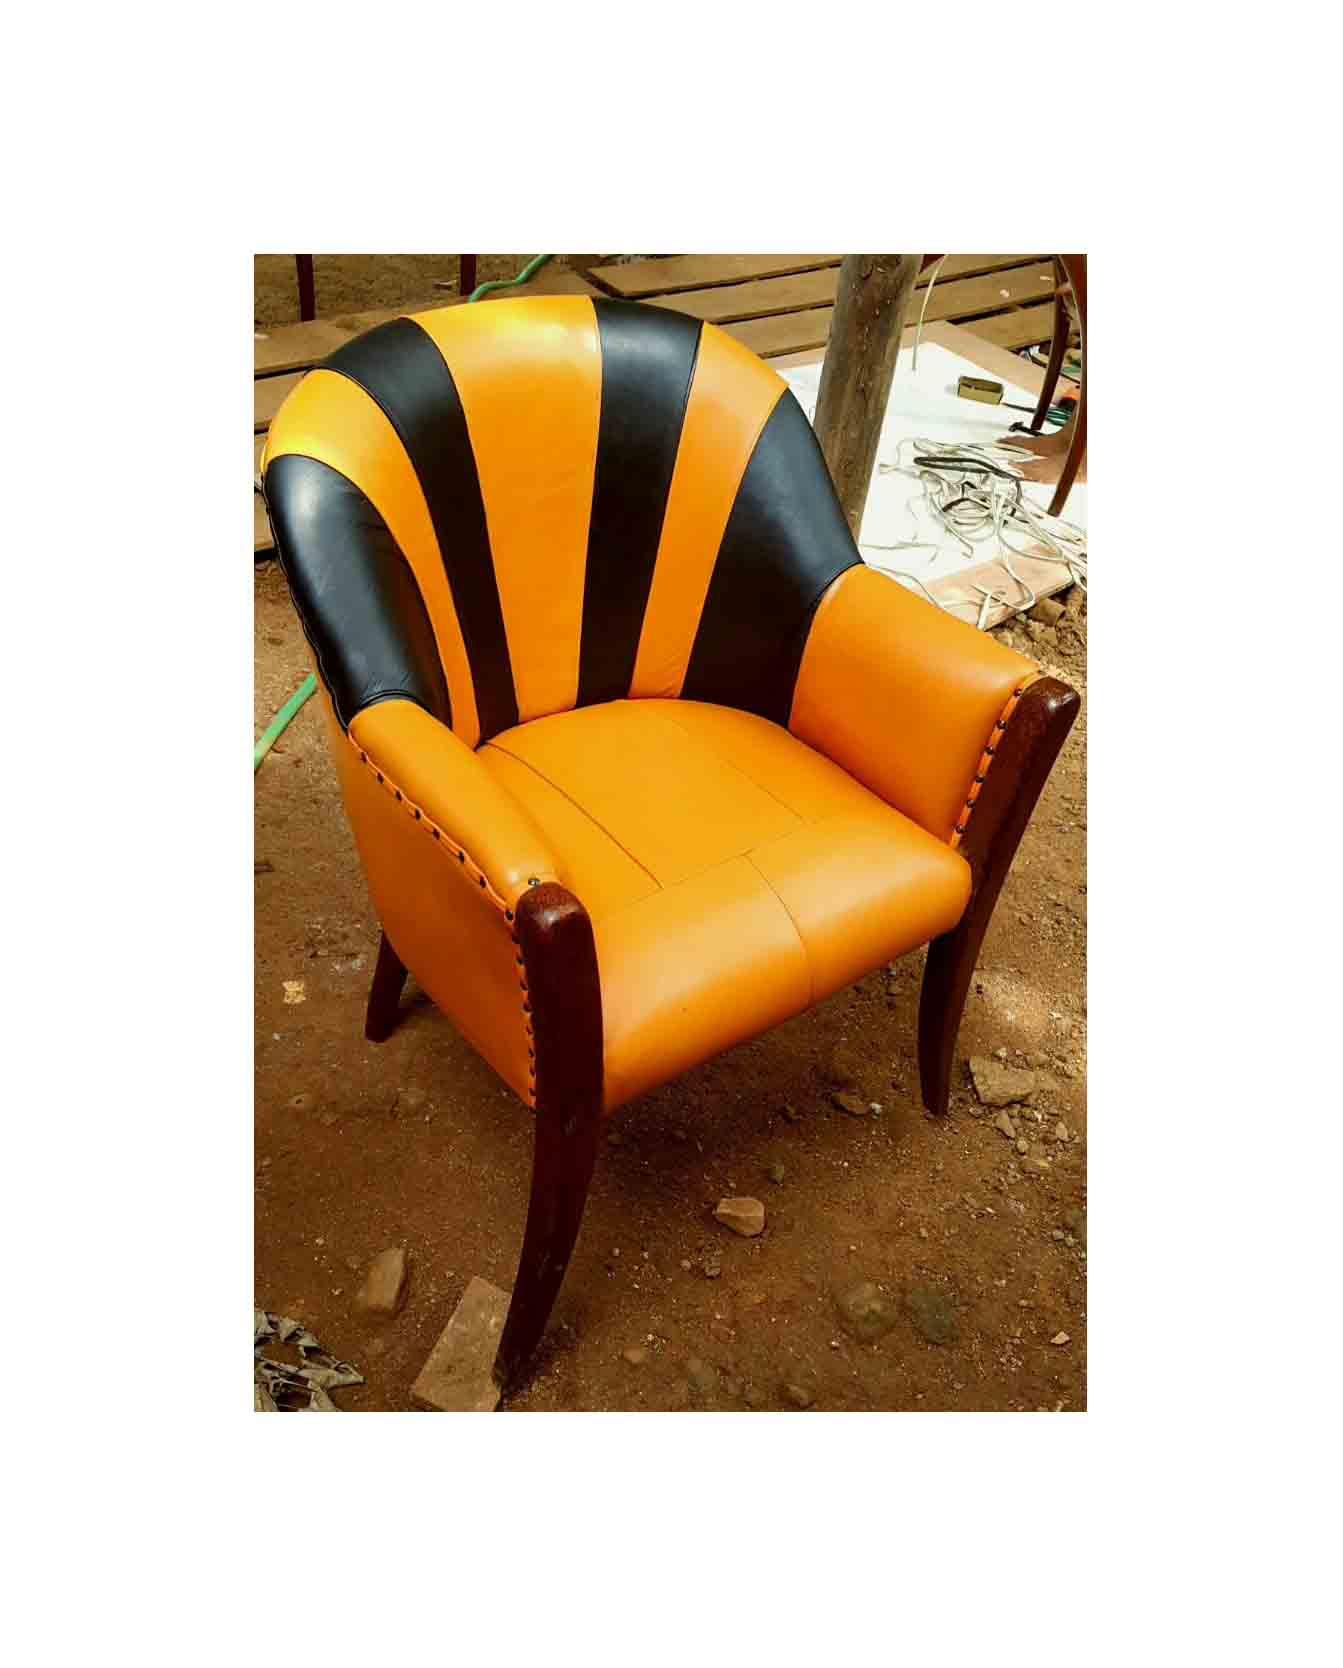 Peachy Surya Java Furnindo Cv Palmwood Cow Leather Gondo Chair Alphanode Cool Chair Designs And Ideas Alphanodeonline